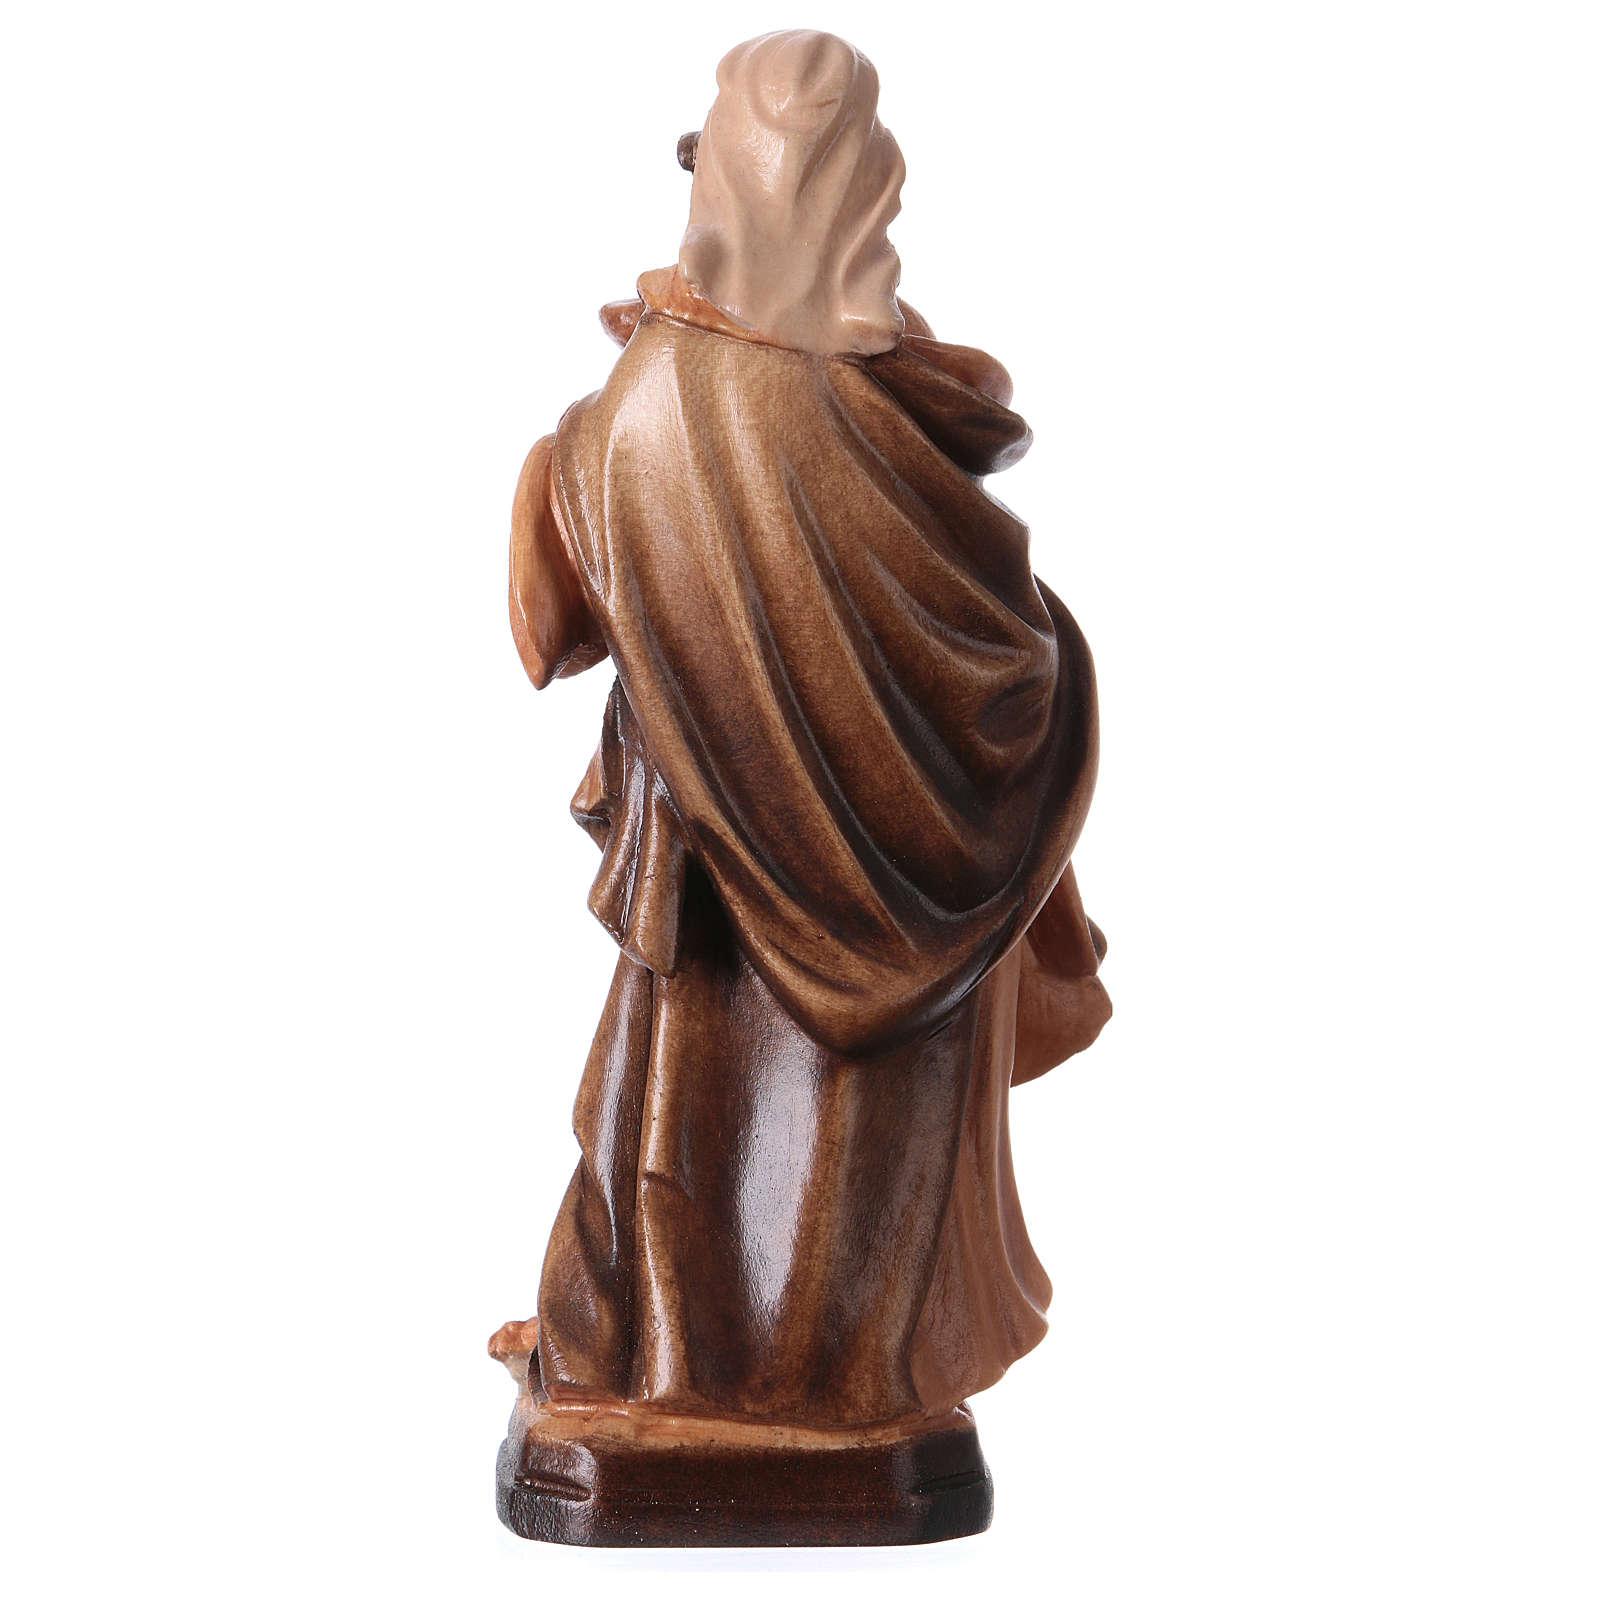 Santa Magdalena de madera, acabado con diferentes matices de marrón 4